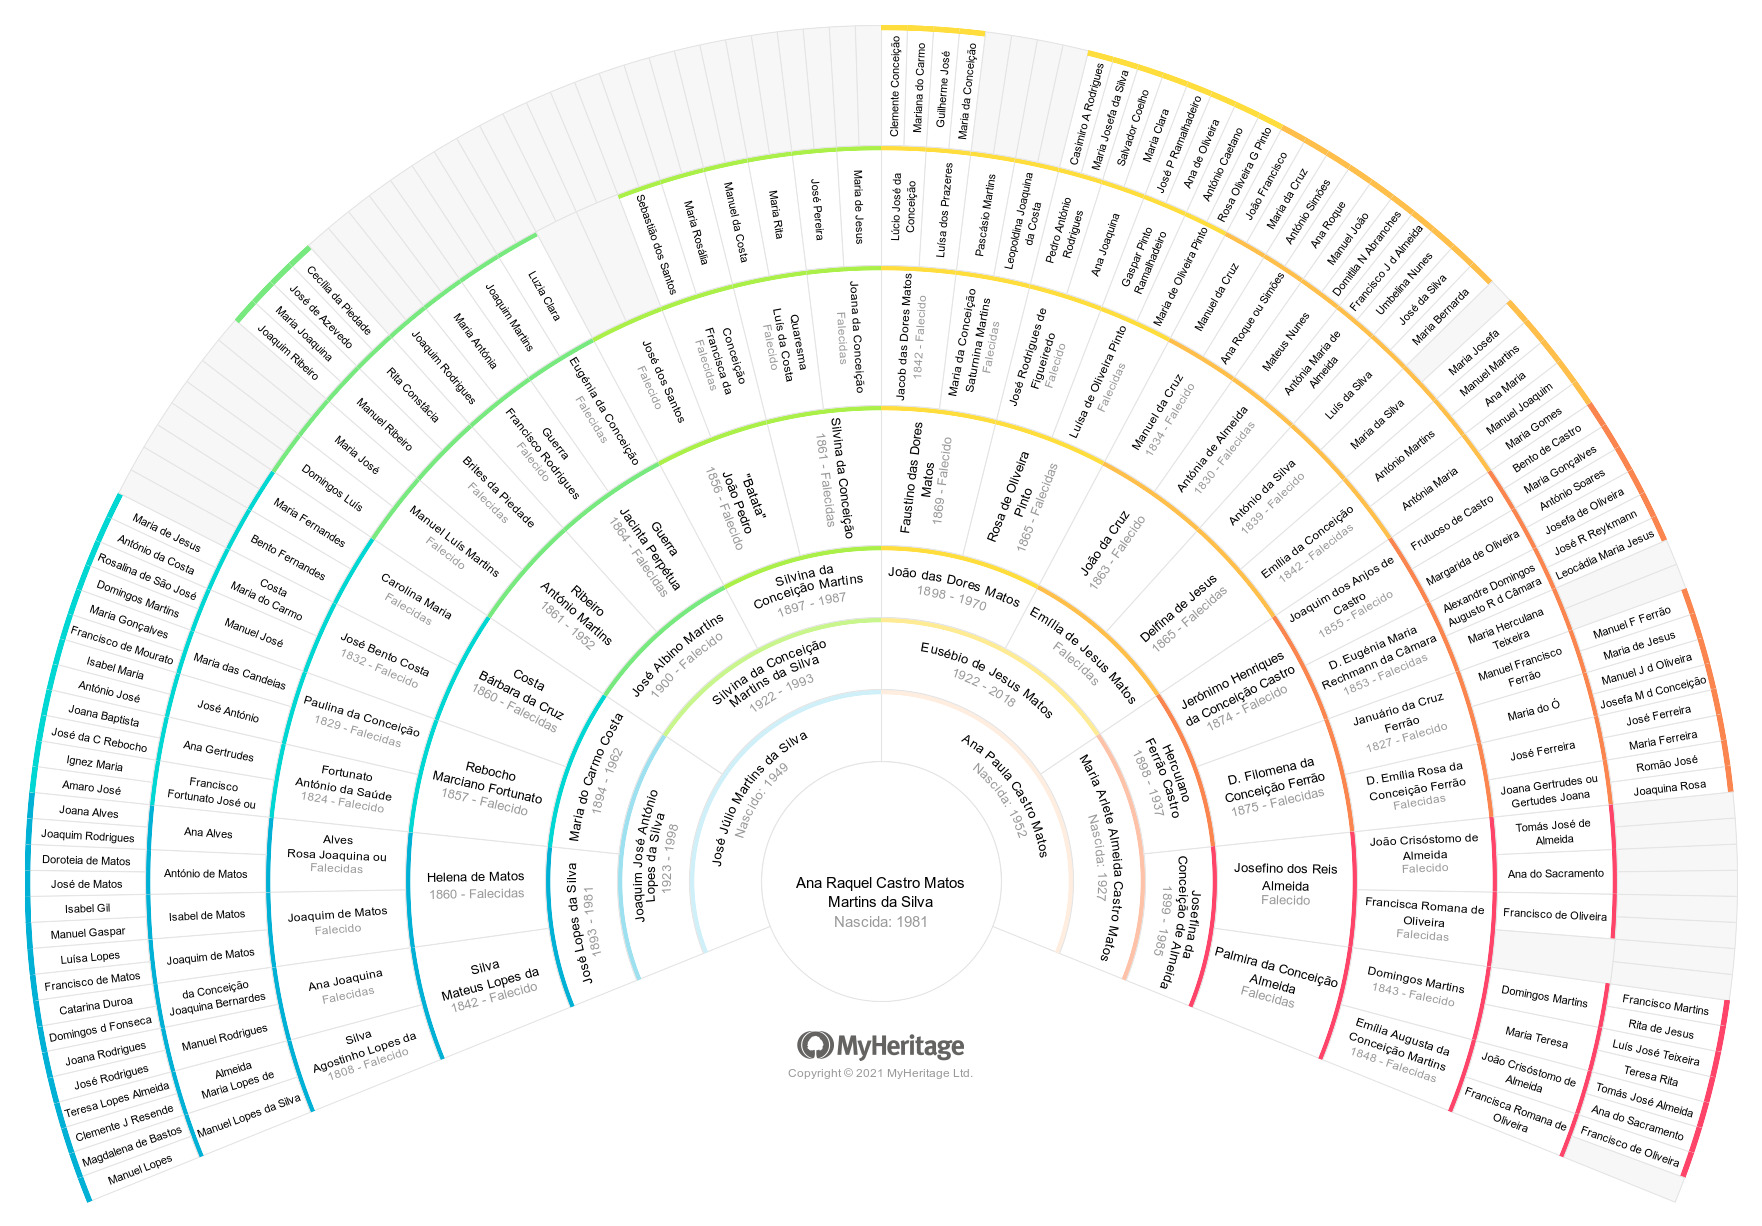 MyHeritage-Fan-Chart-Ana-Raquel-Castro-Matos-Martins-da-Silva1